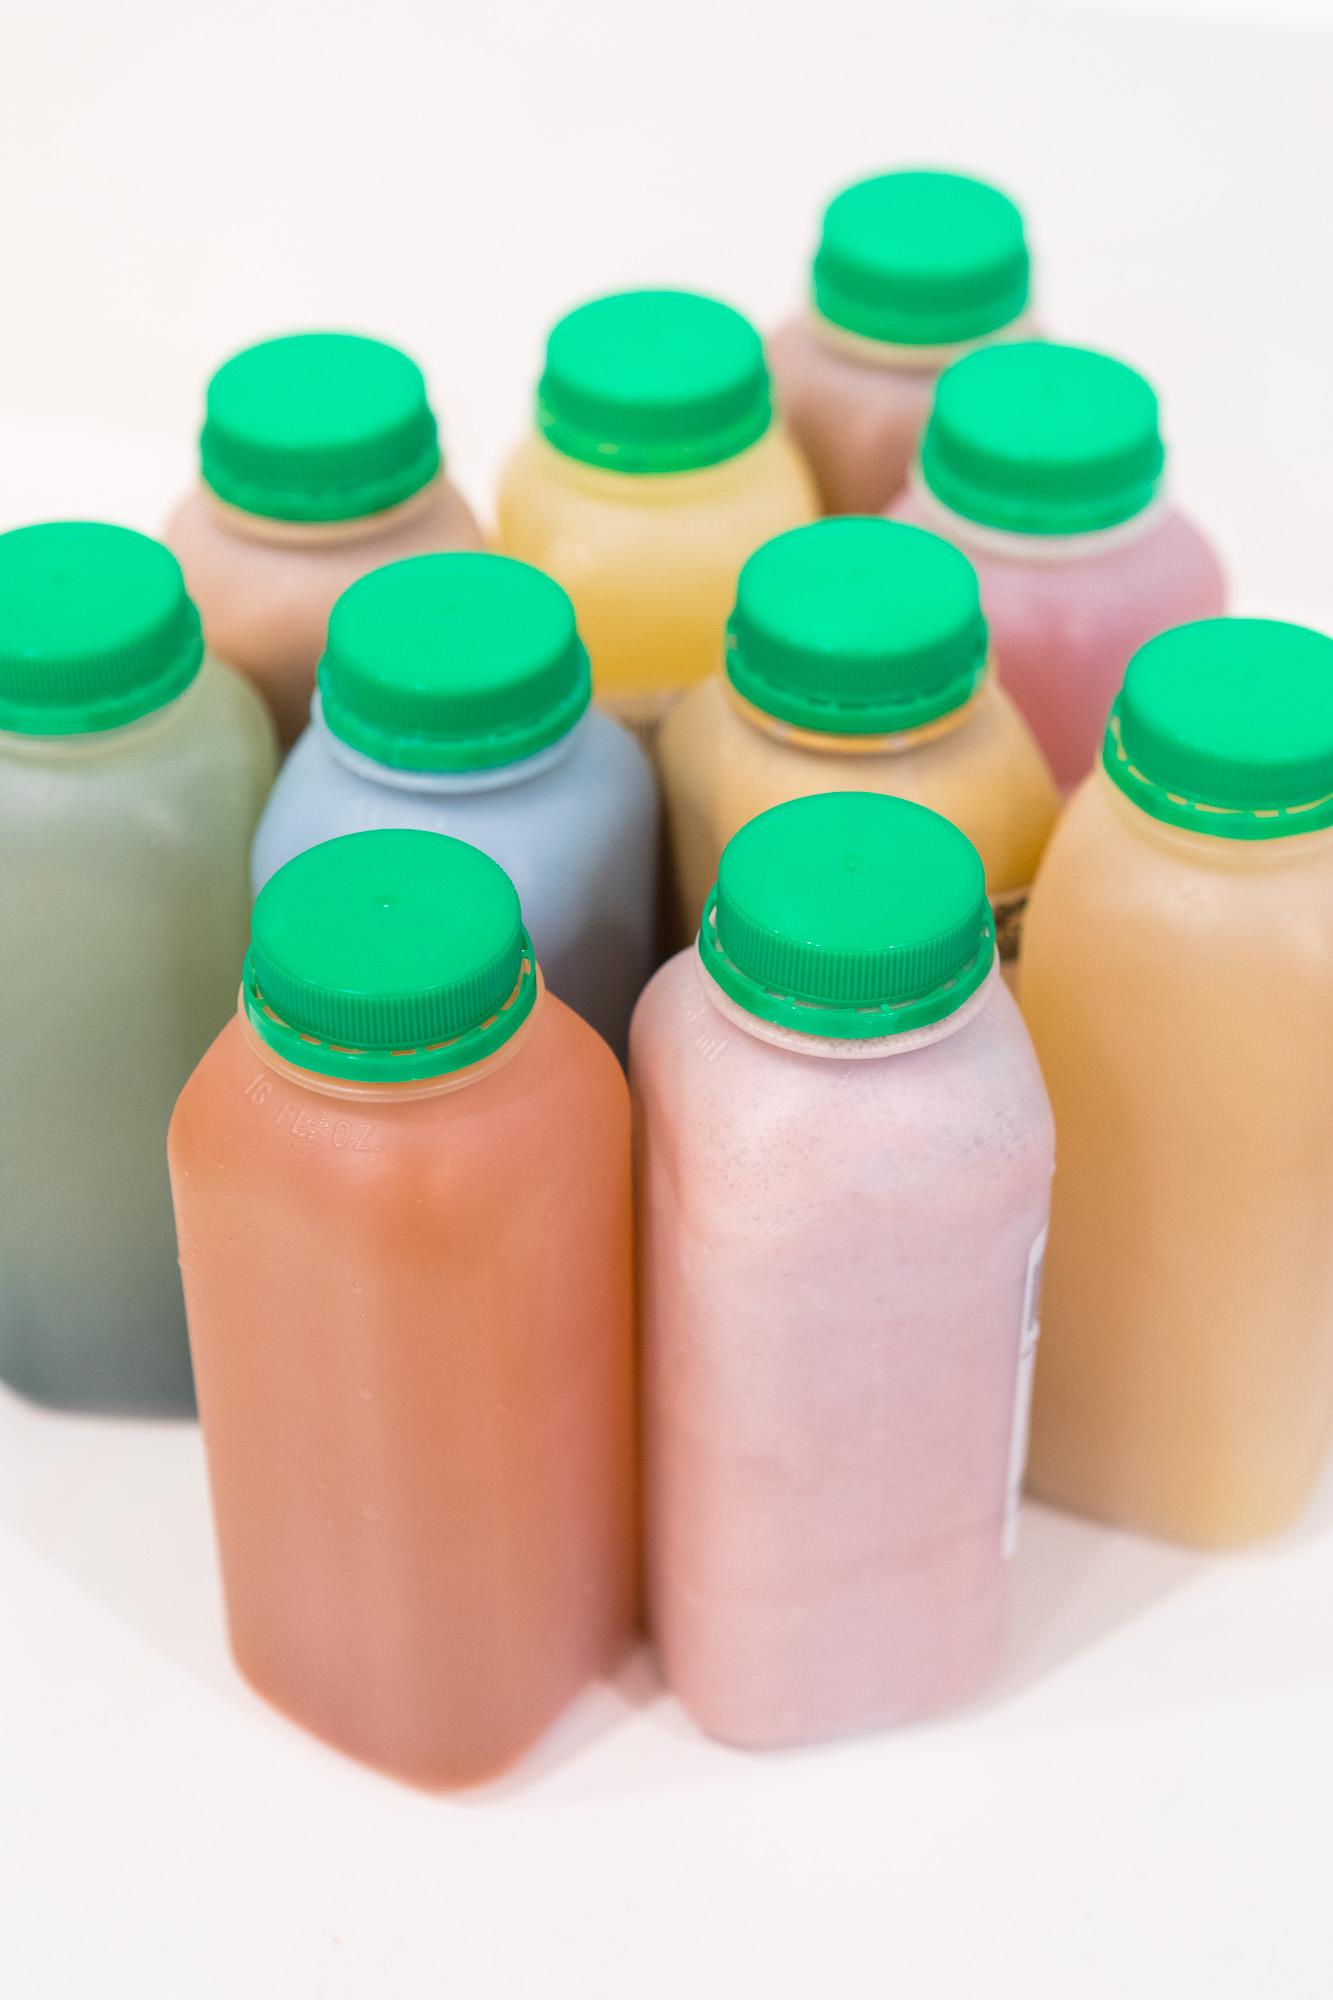 Maka-paia-maui-fresh-bottled-juices-1.jpg